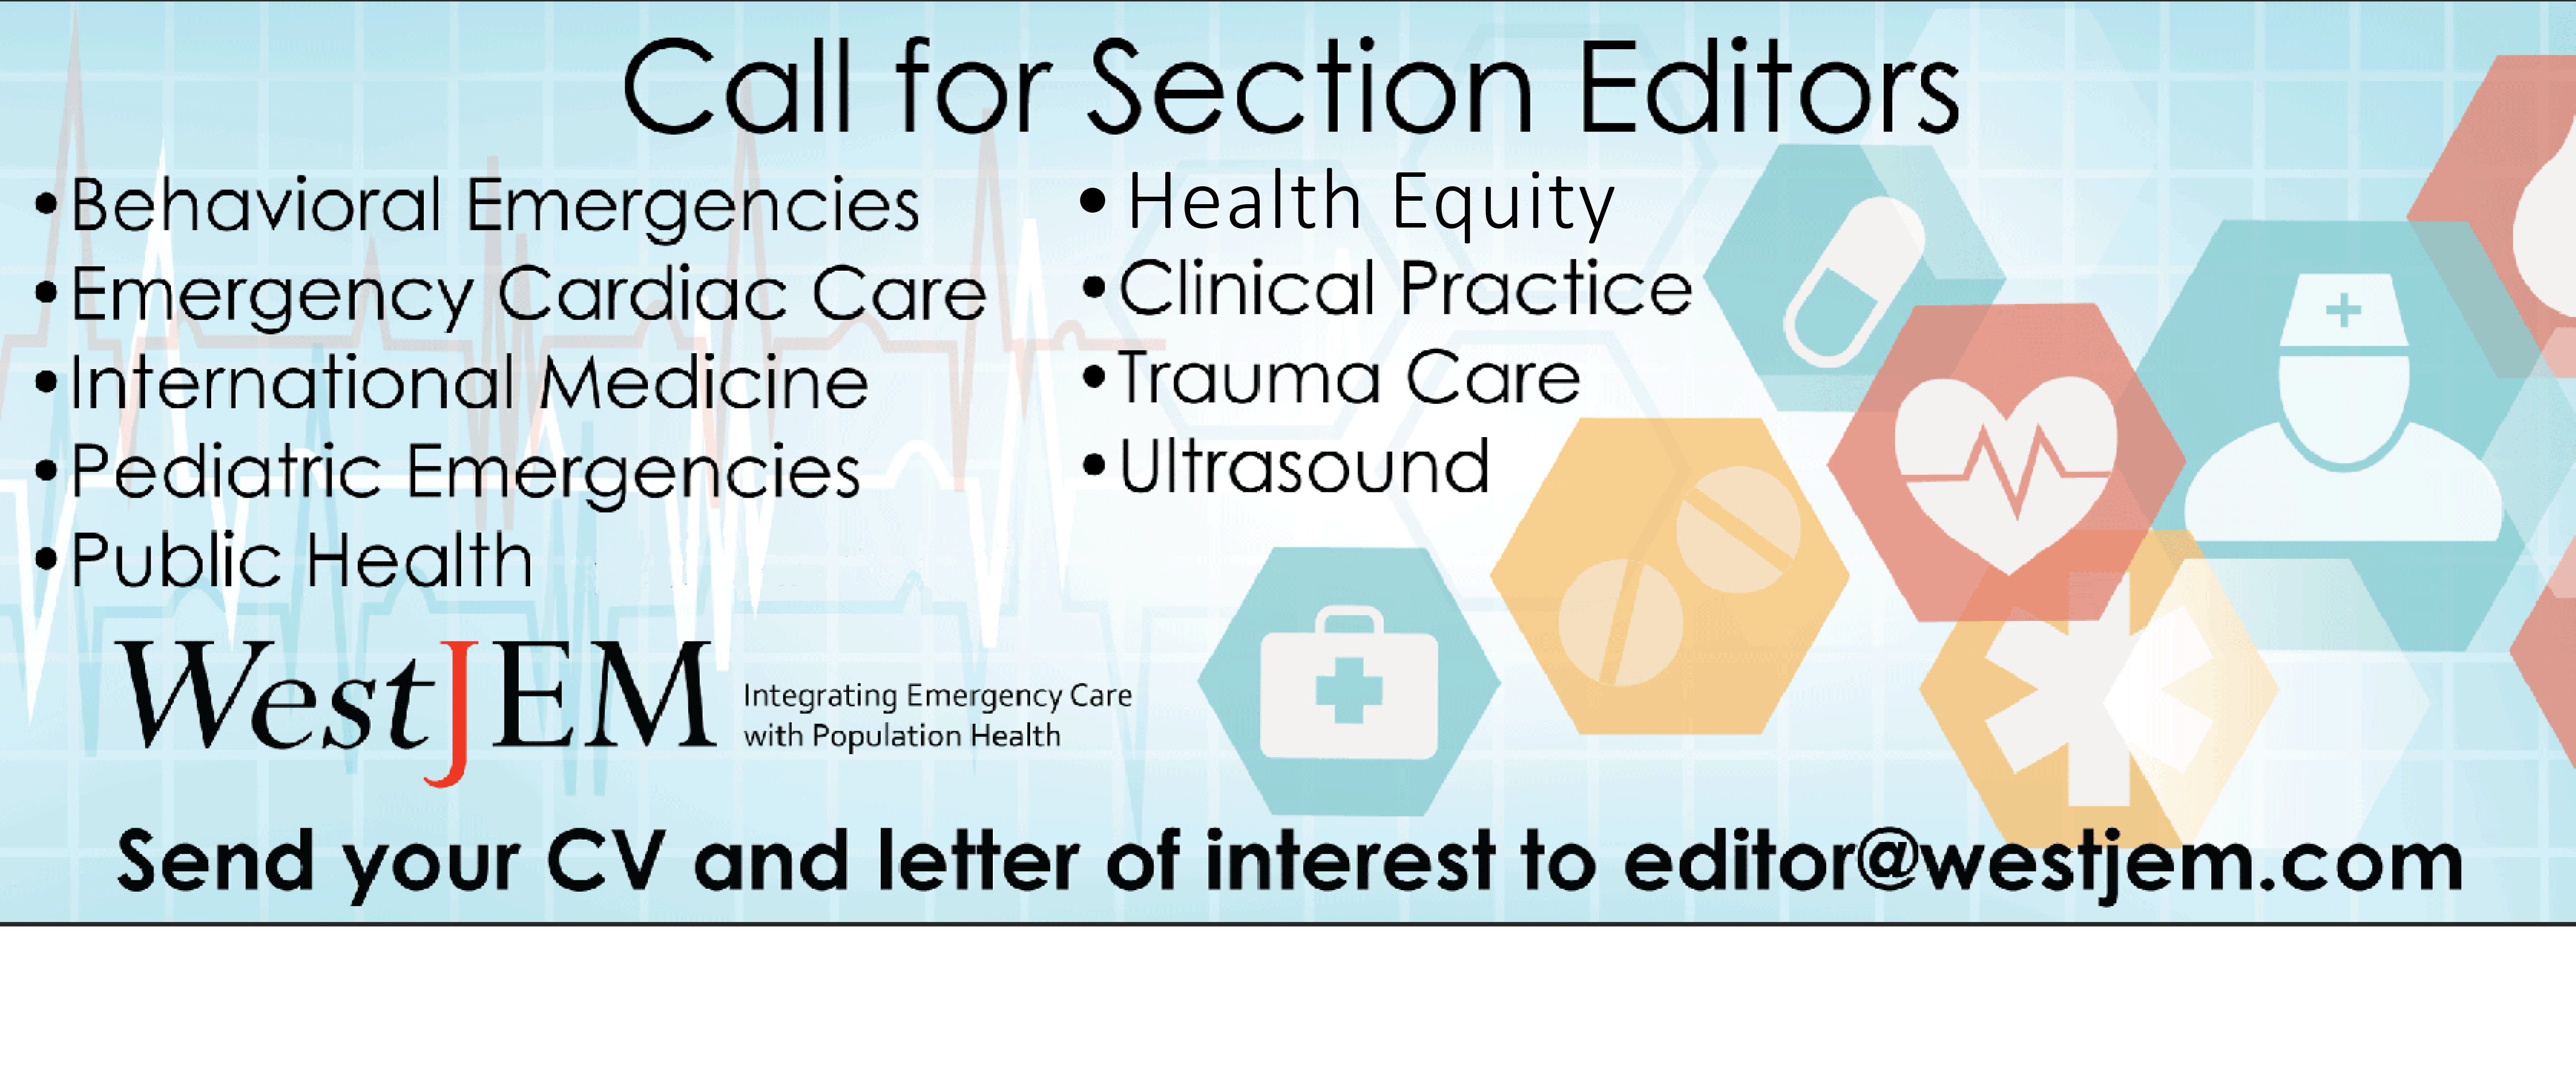 Call-for-Editors-Ad-5